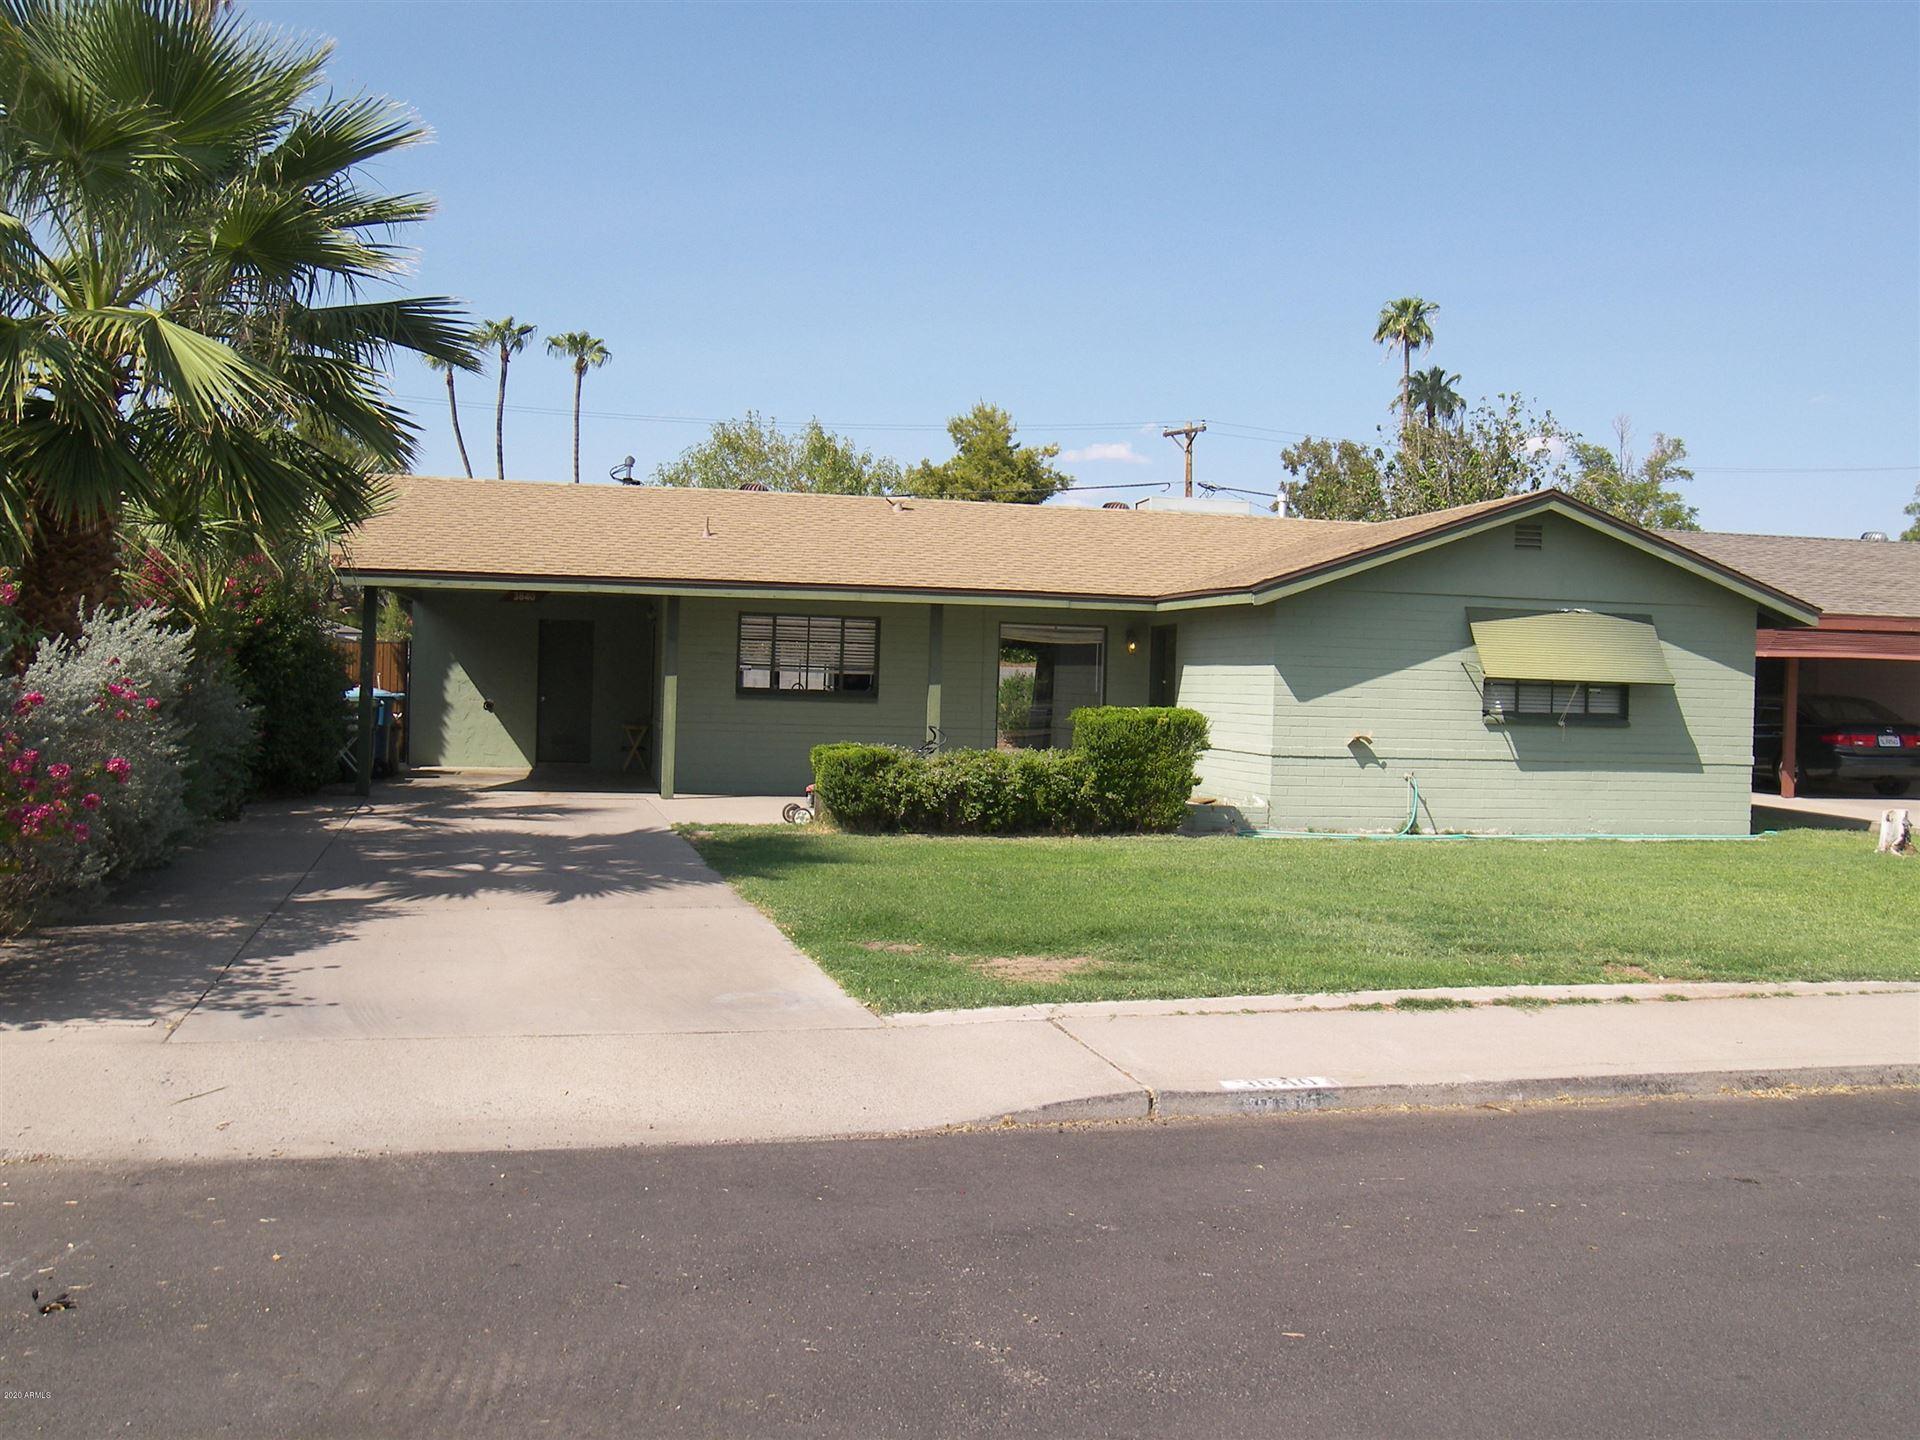 3840 E WILSHIRE Drive, Phoenix, AZ 85008 - MLS#: 6132210